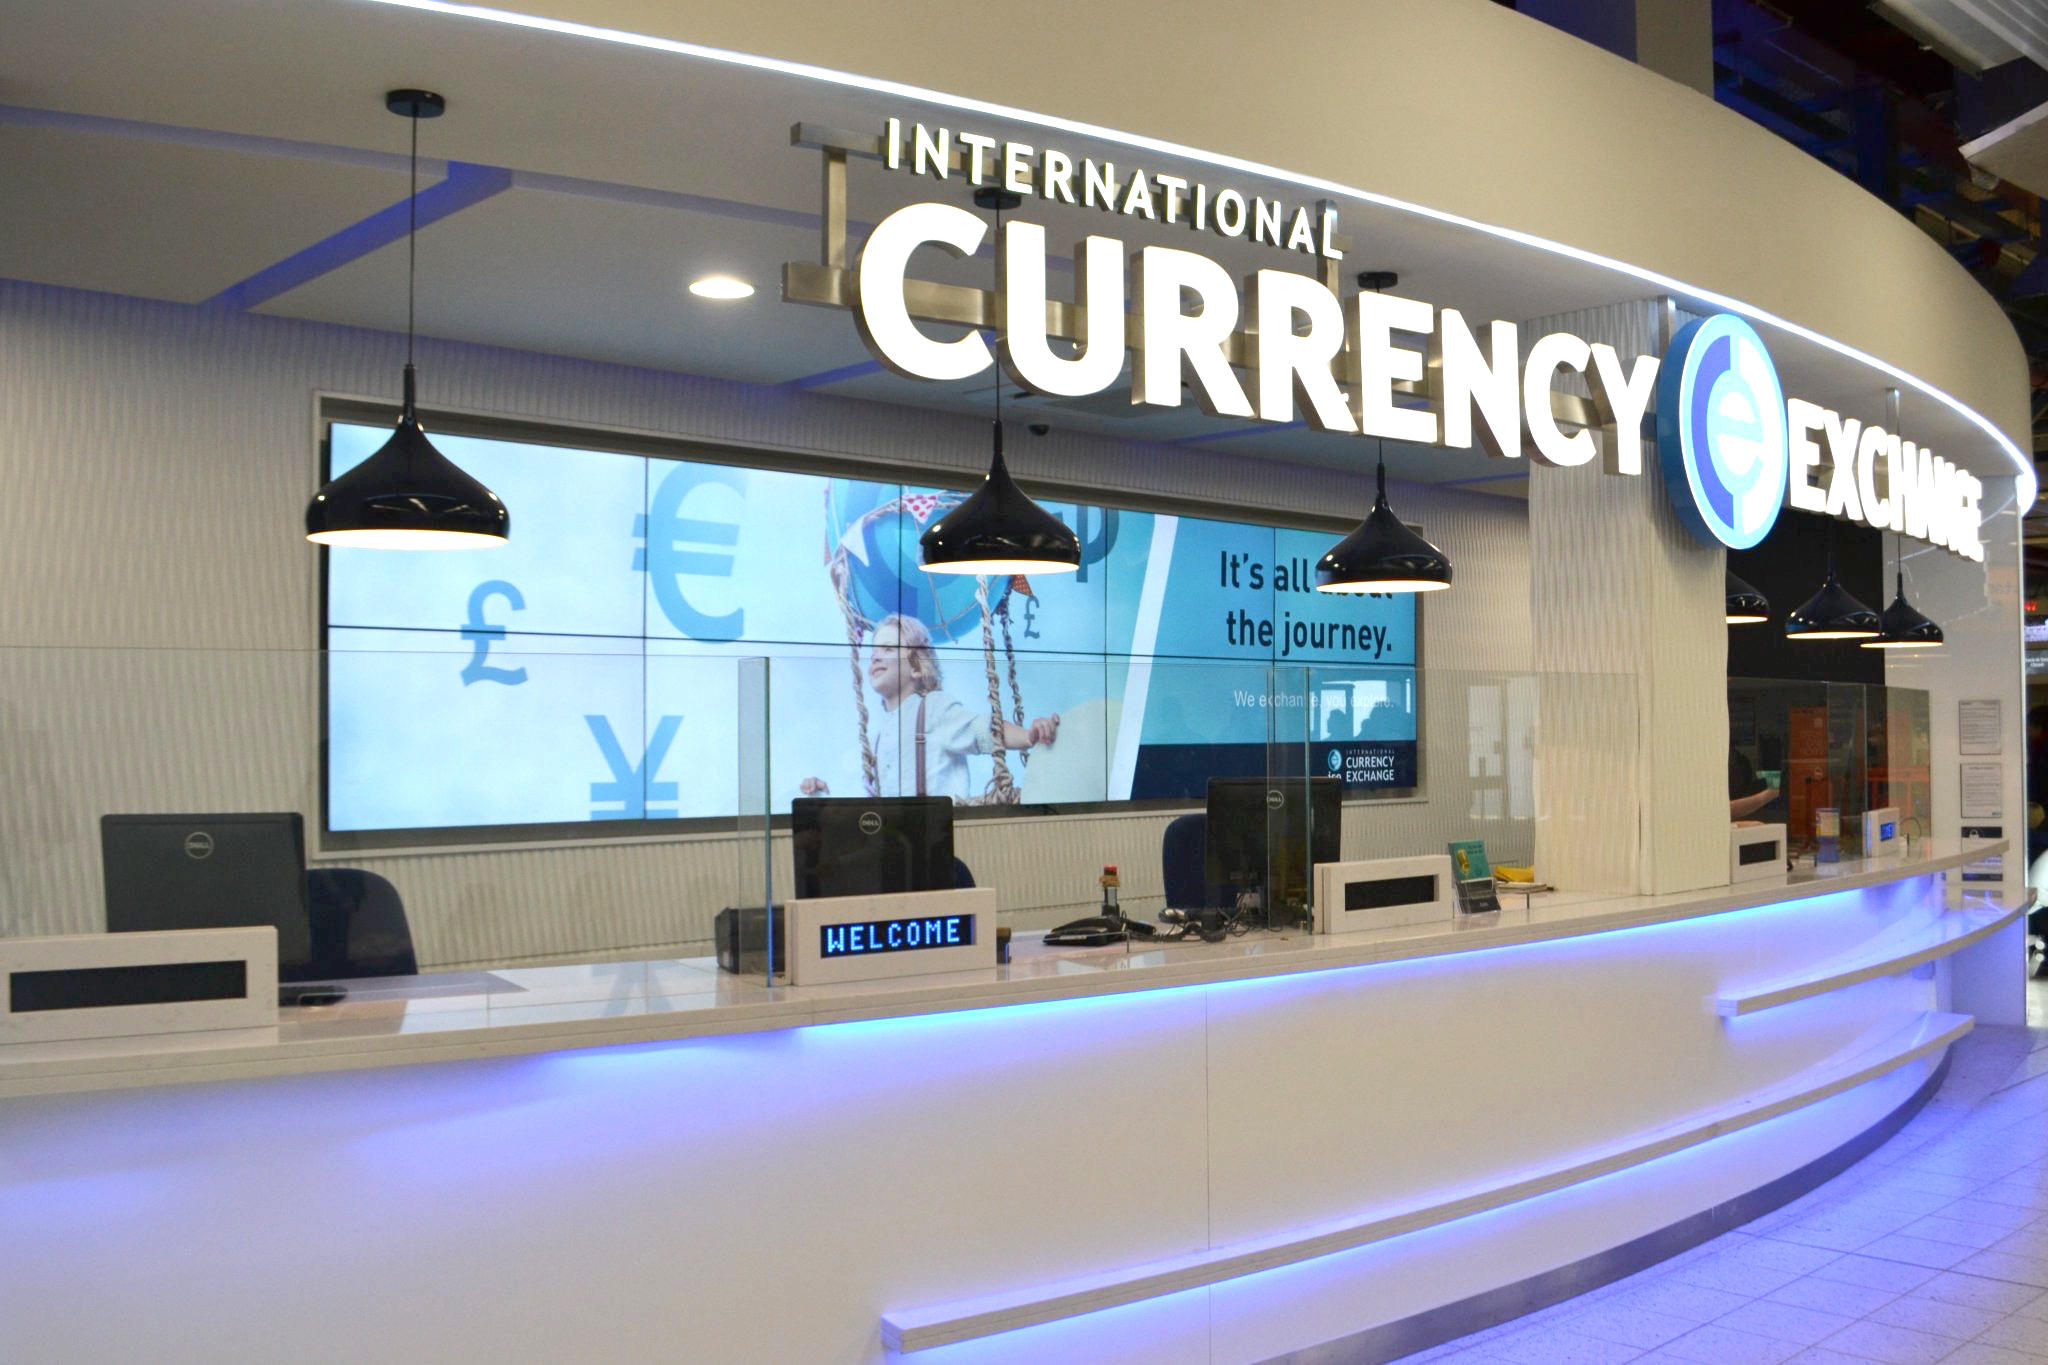 ICE - International Currency Exchange Luton 01582 730700